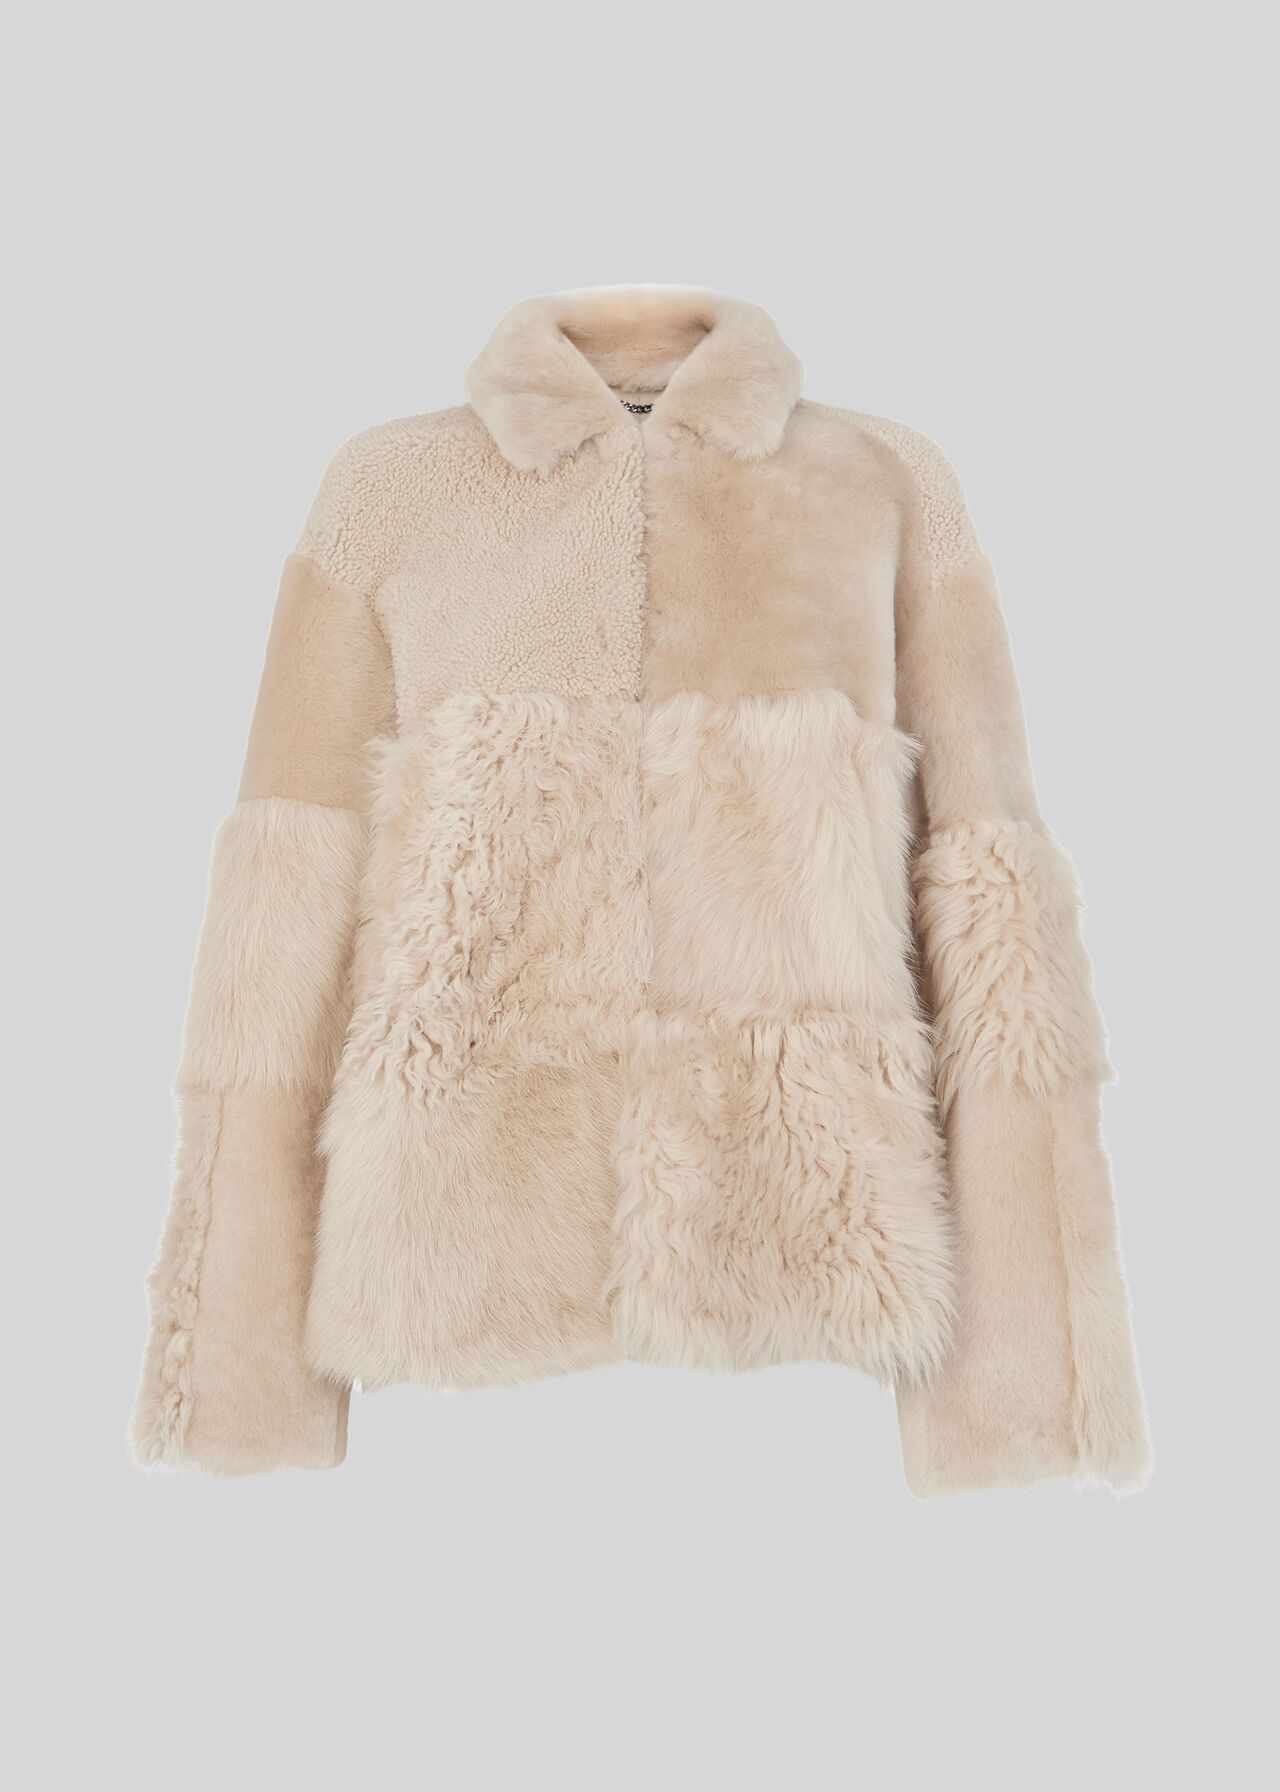 Hema Shearling Coat Ivory/Multi